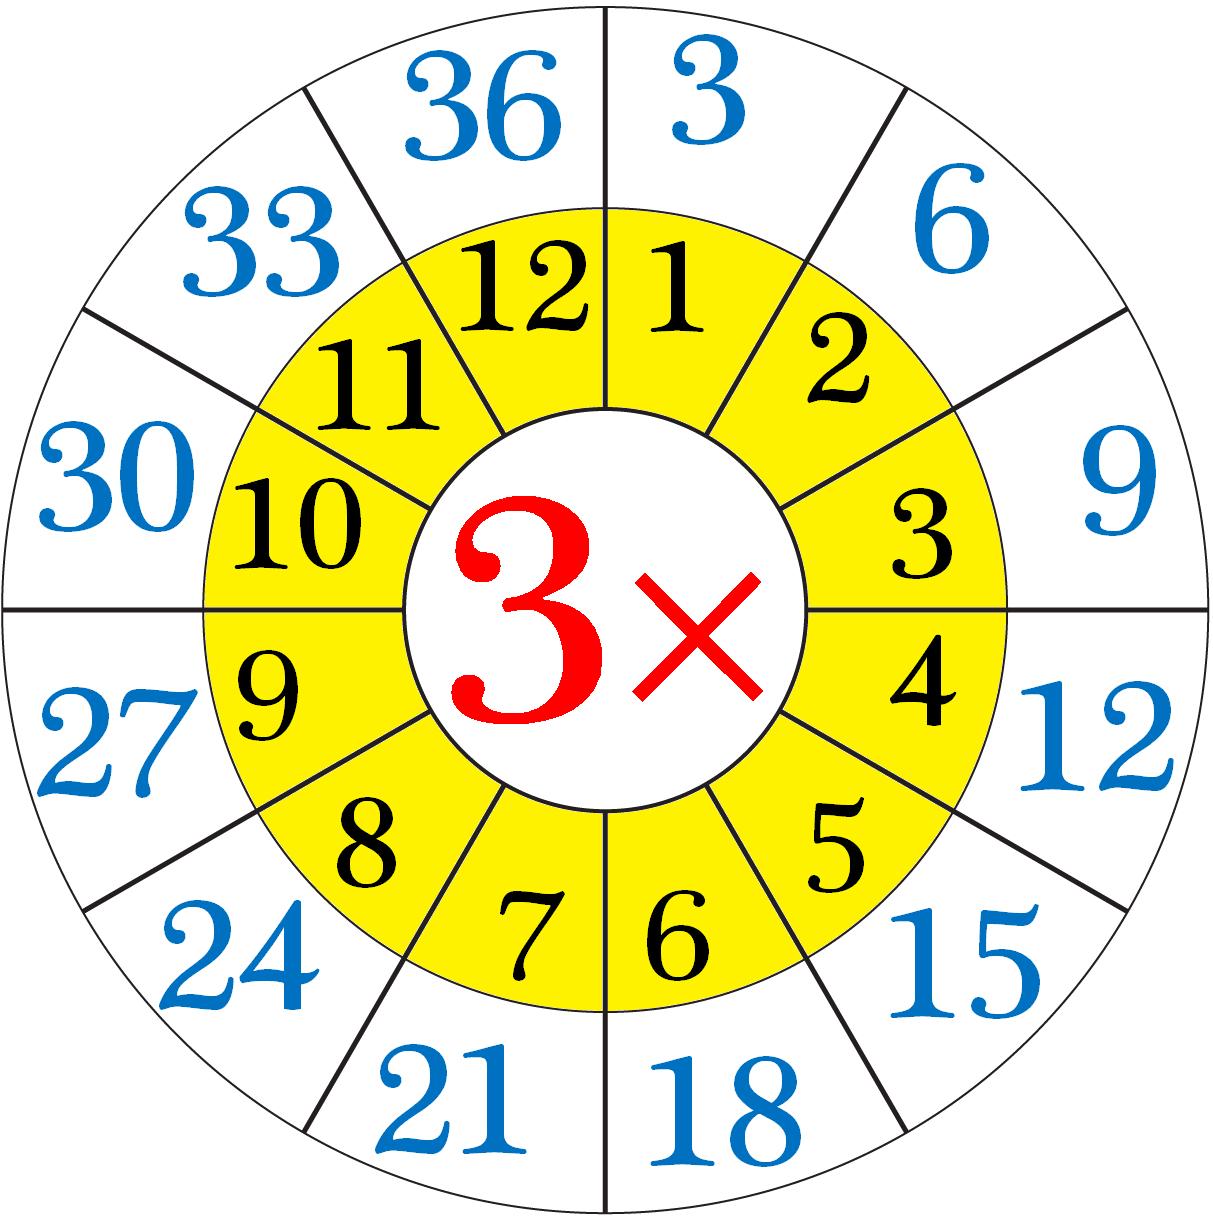 Worksheet On Multiplication Table Of 3 | Word Problems On 3 regarding Printable Multiplication Wheels